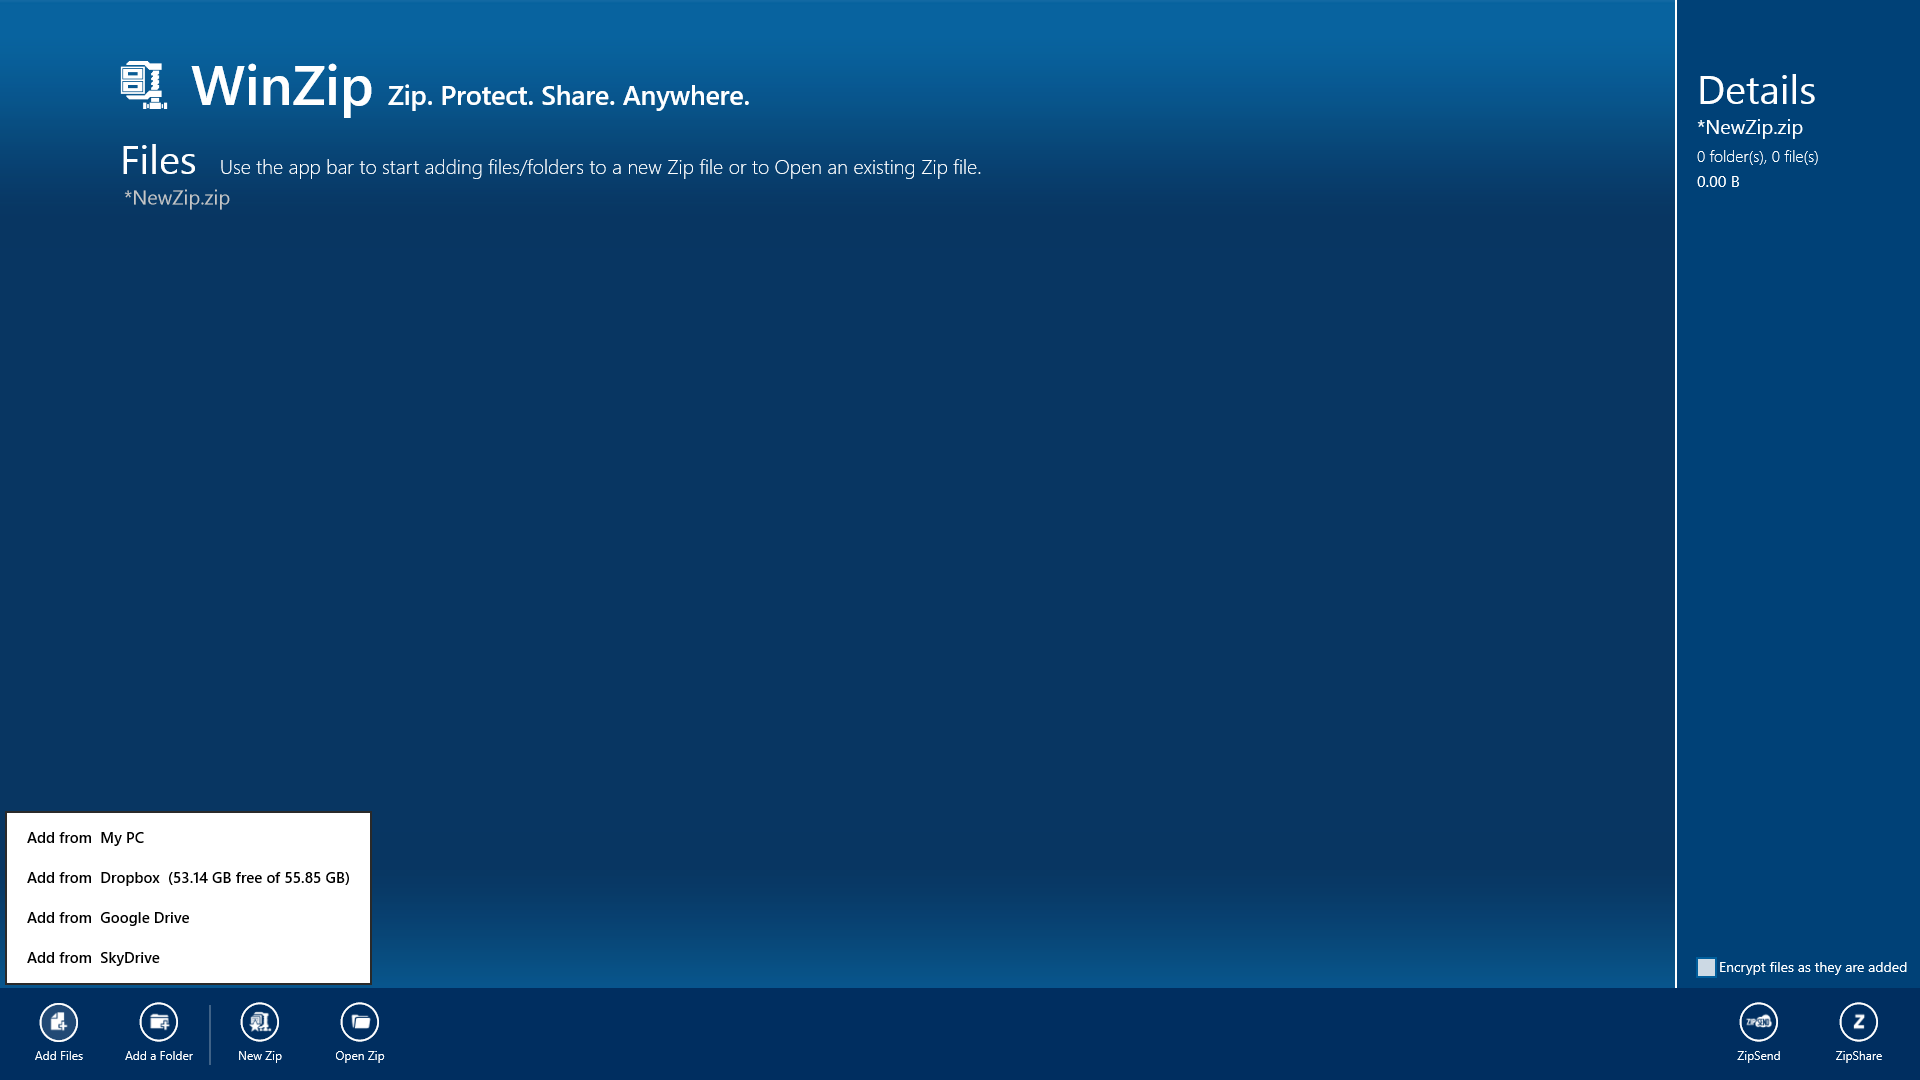 Download WinZip for Windows